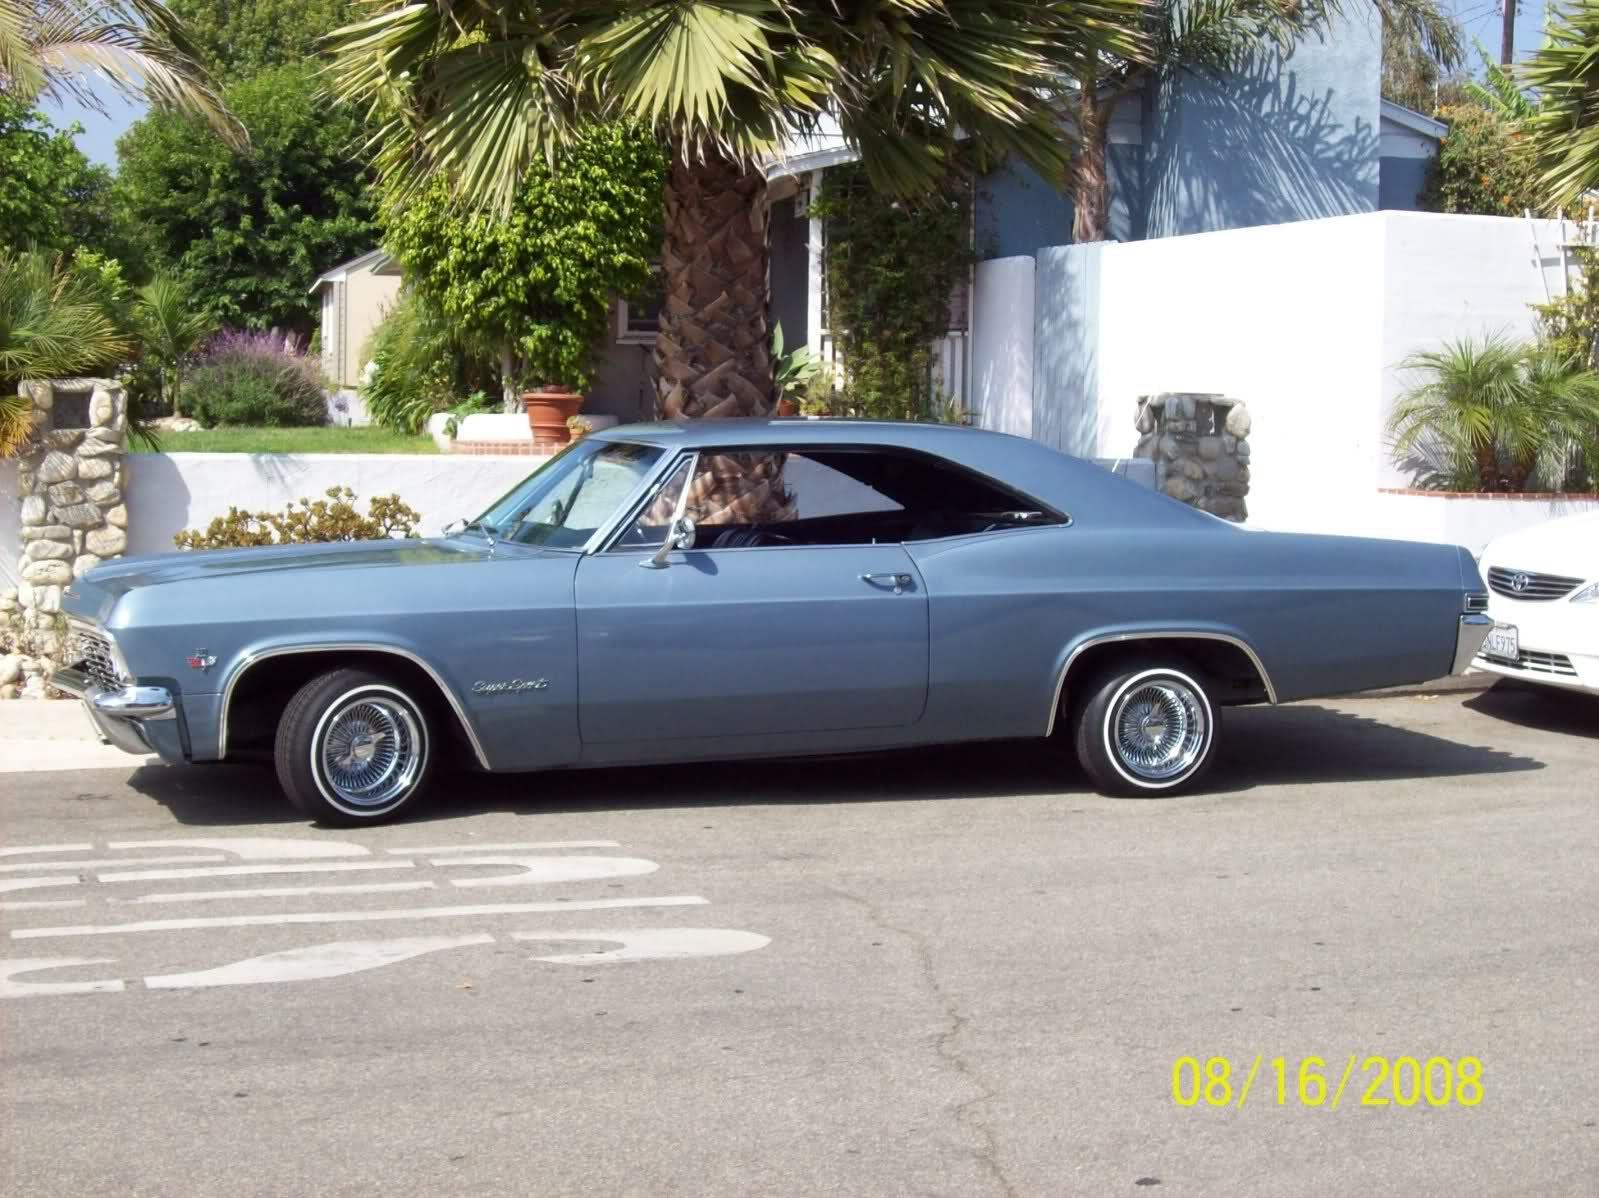 1965 chevy impala 1965 chevy impala ss lowrider p7g8sve7